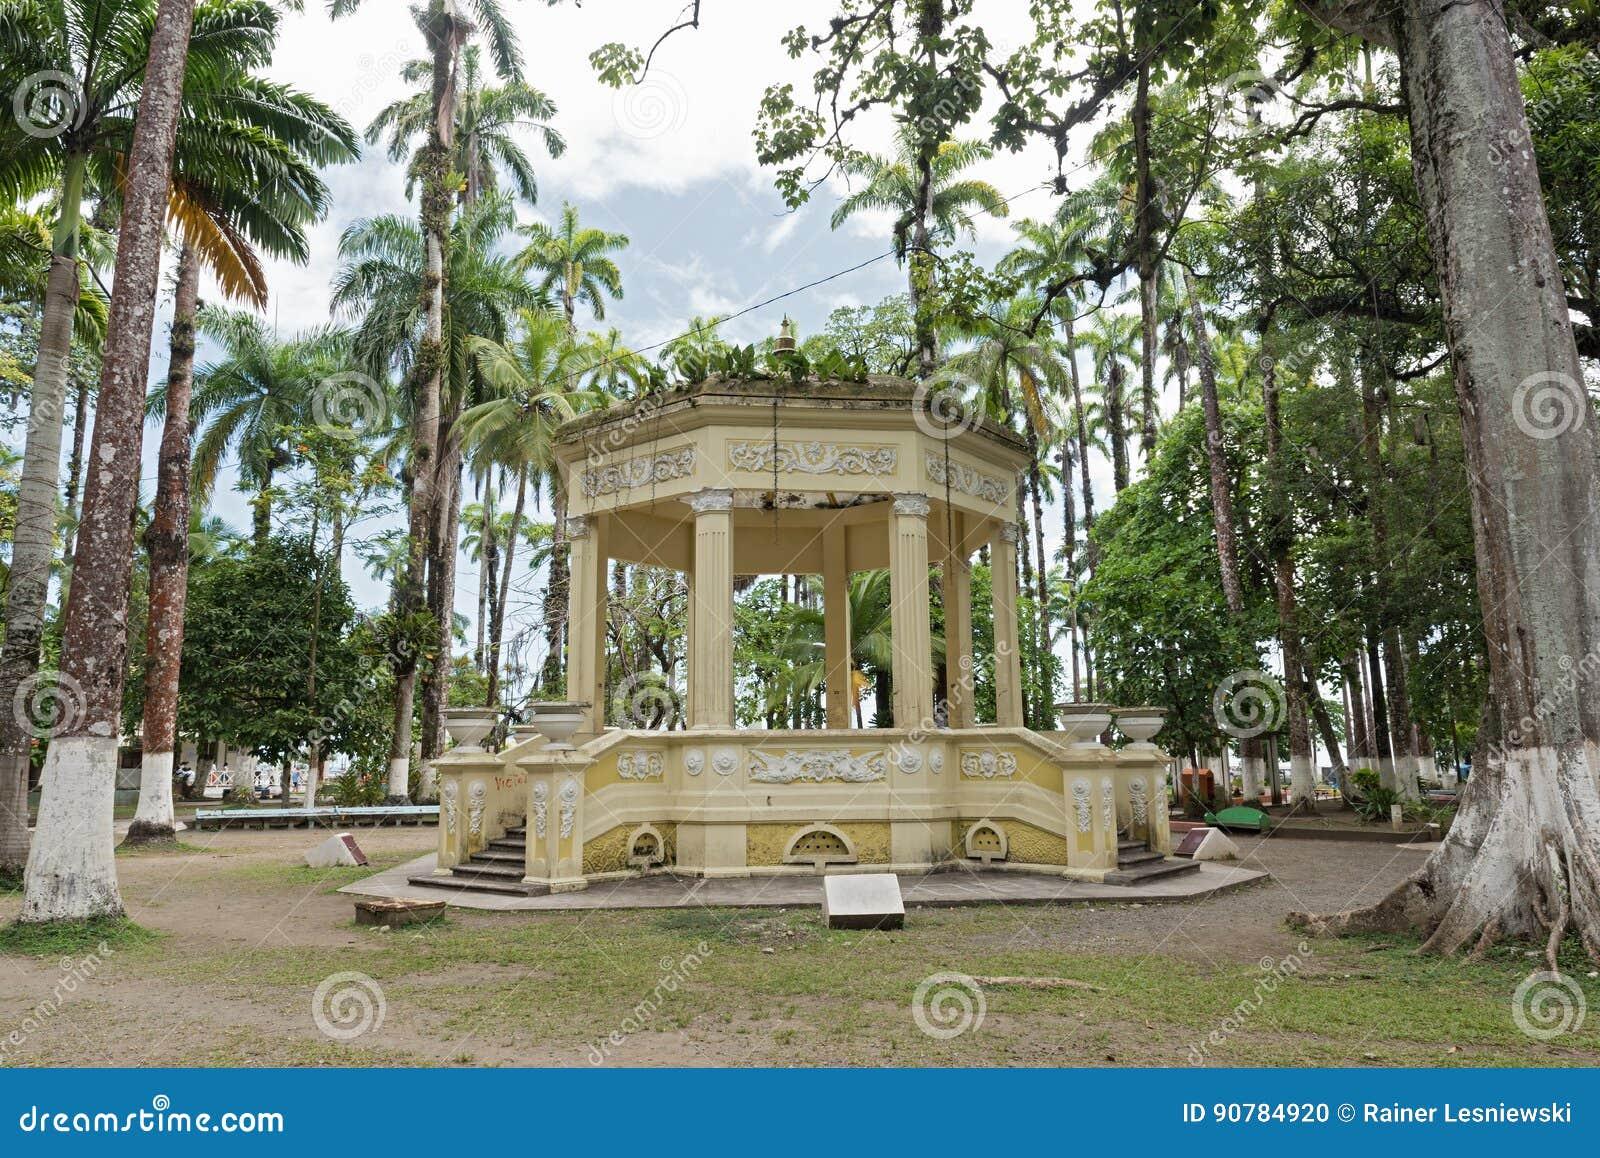 Gelber Pavillon in Parque Vargas, Stadt-Park in Puerto Limon, Costa Rica